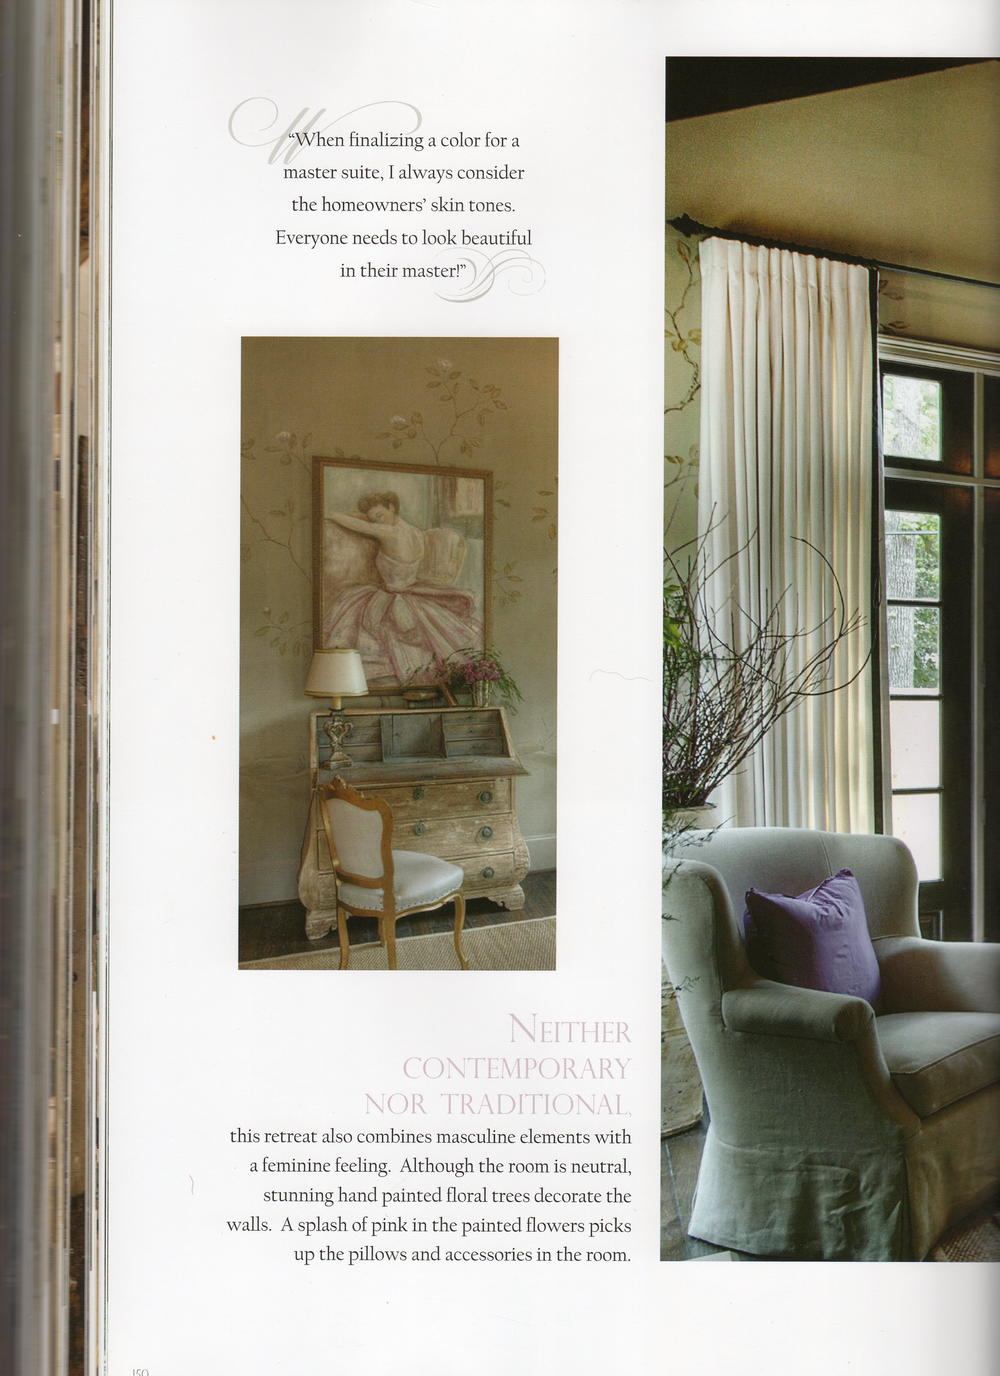 Segreto:Secrets to Finishing Beautiful Interiors Leslie Sinclair 2011